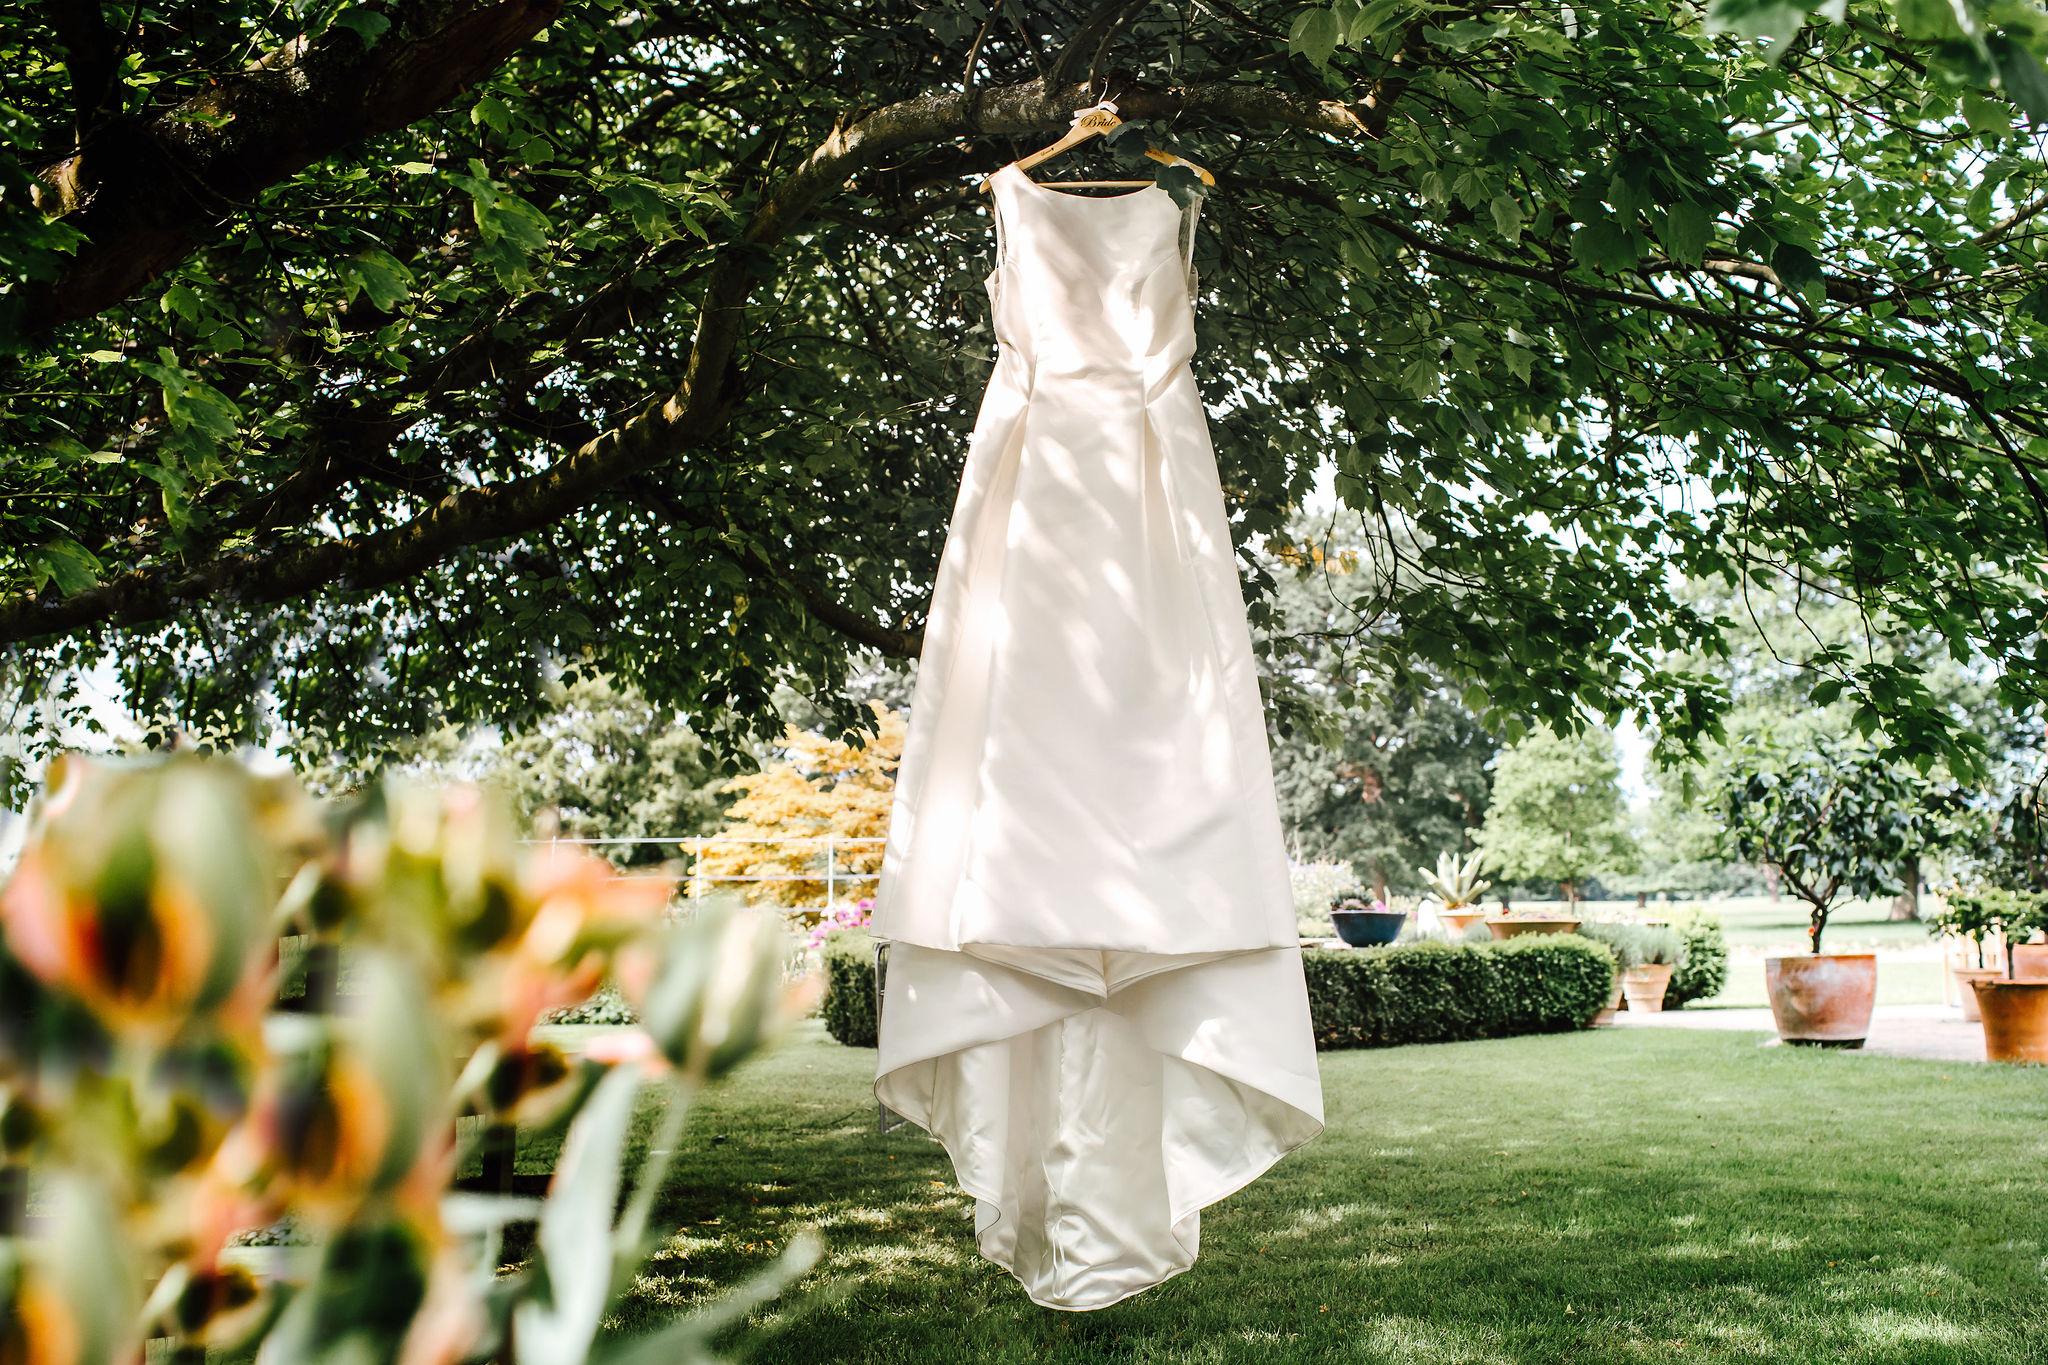 fiesta-fields-louisa-thomas-blog-the-dress-2-abigailwhite.jpg